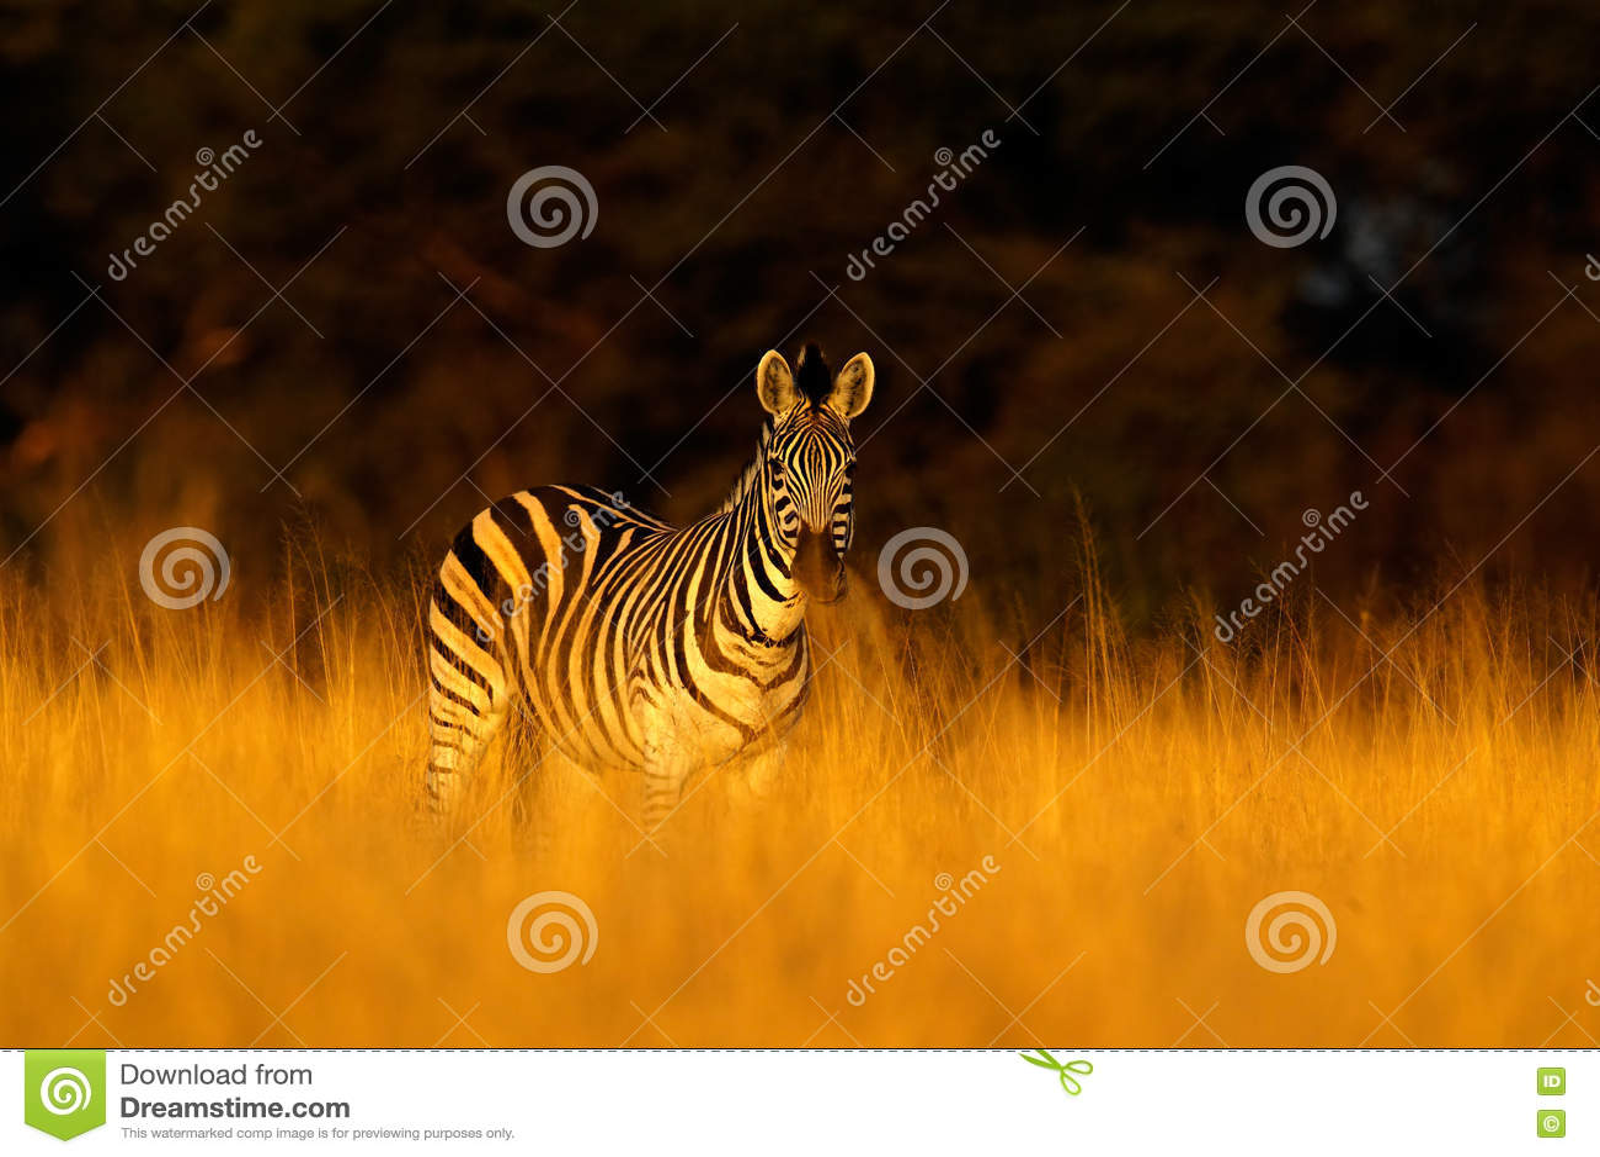 Plains zebra, Equus quagga, in the grass nature habitat, evening light, Hwange National Park Zimbabwe